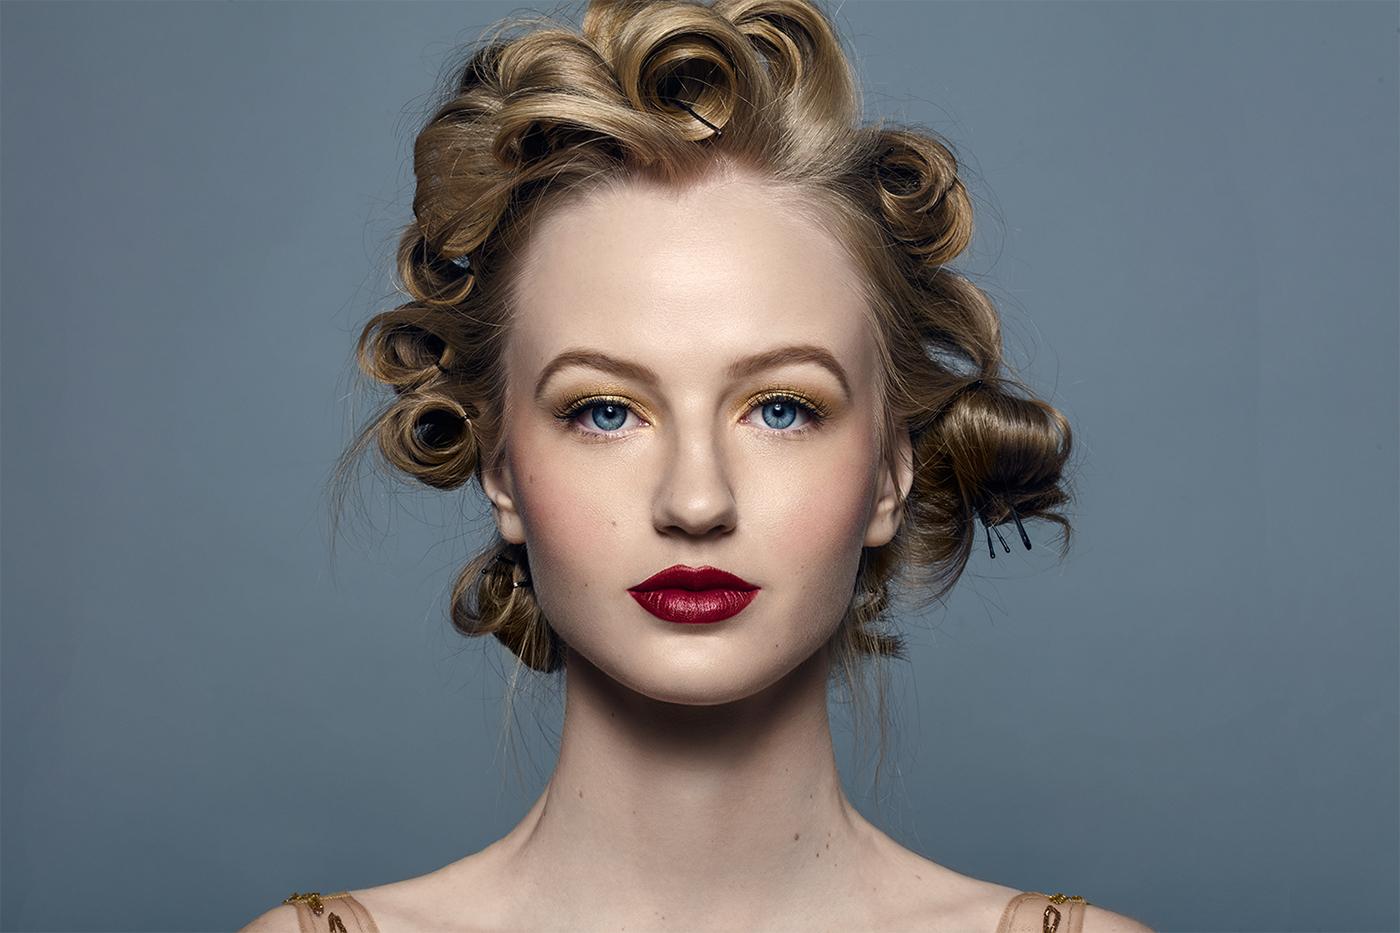 beauty woman post Production retouching  retouch tratamento Imagem dodge burn